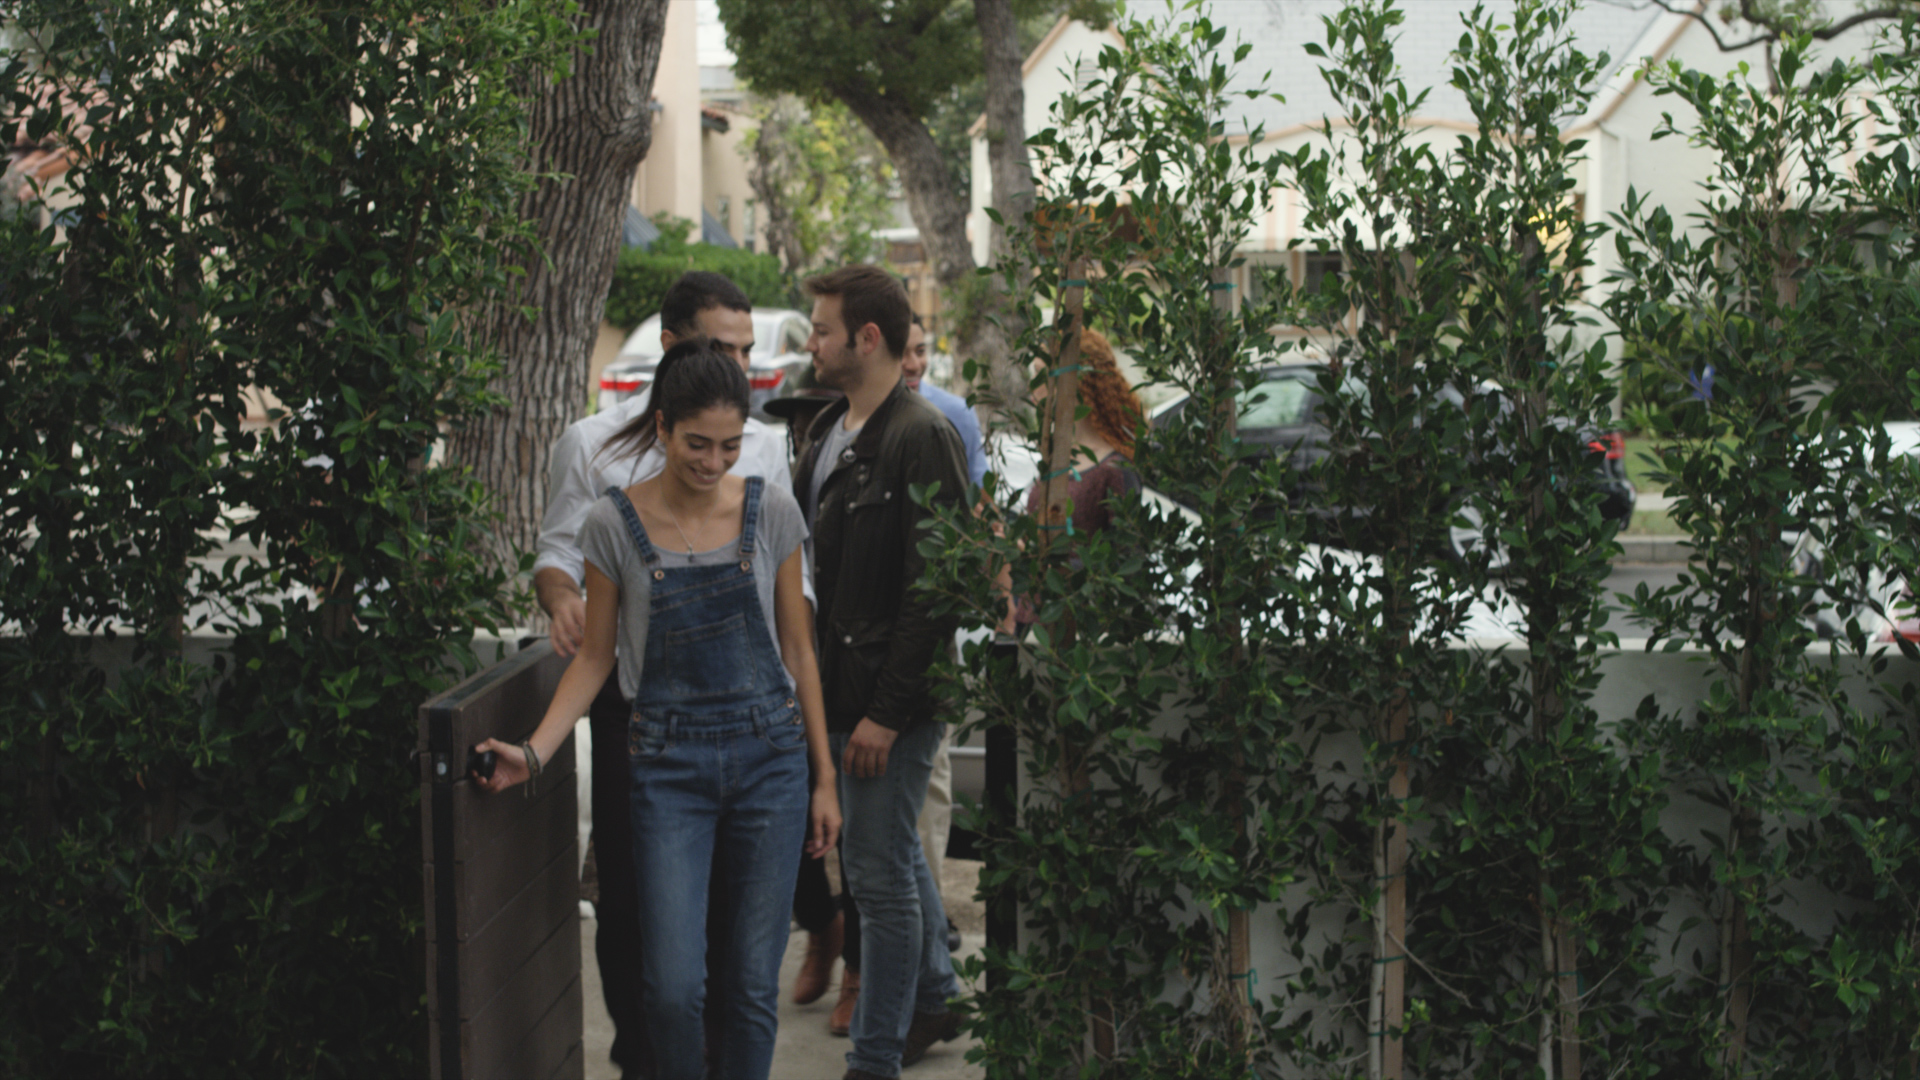 actors-los angeles-prizm-yard-fun-woodwalk